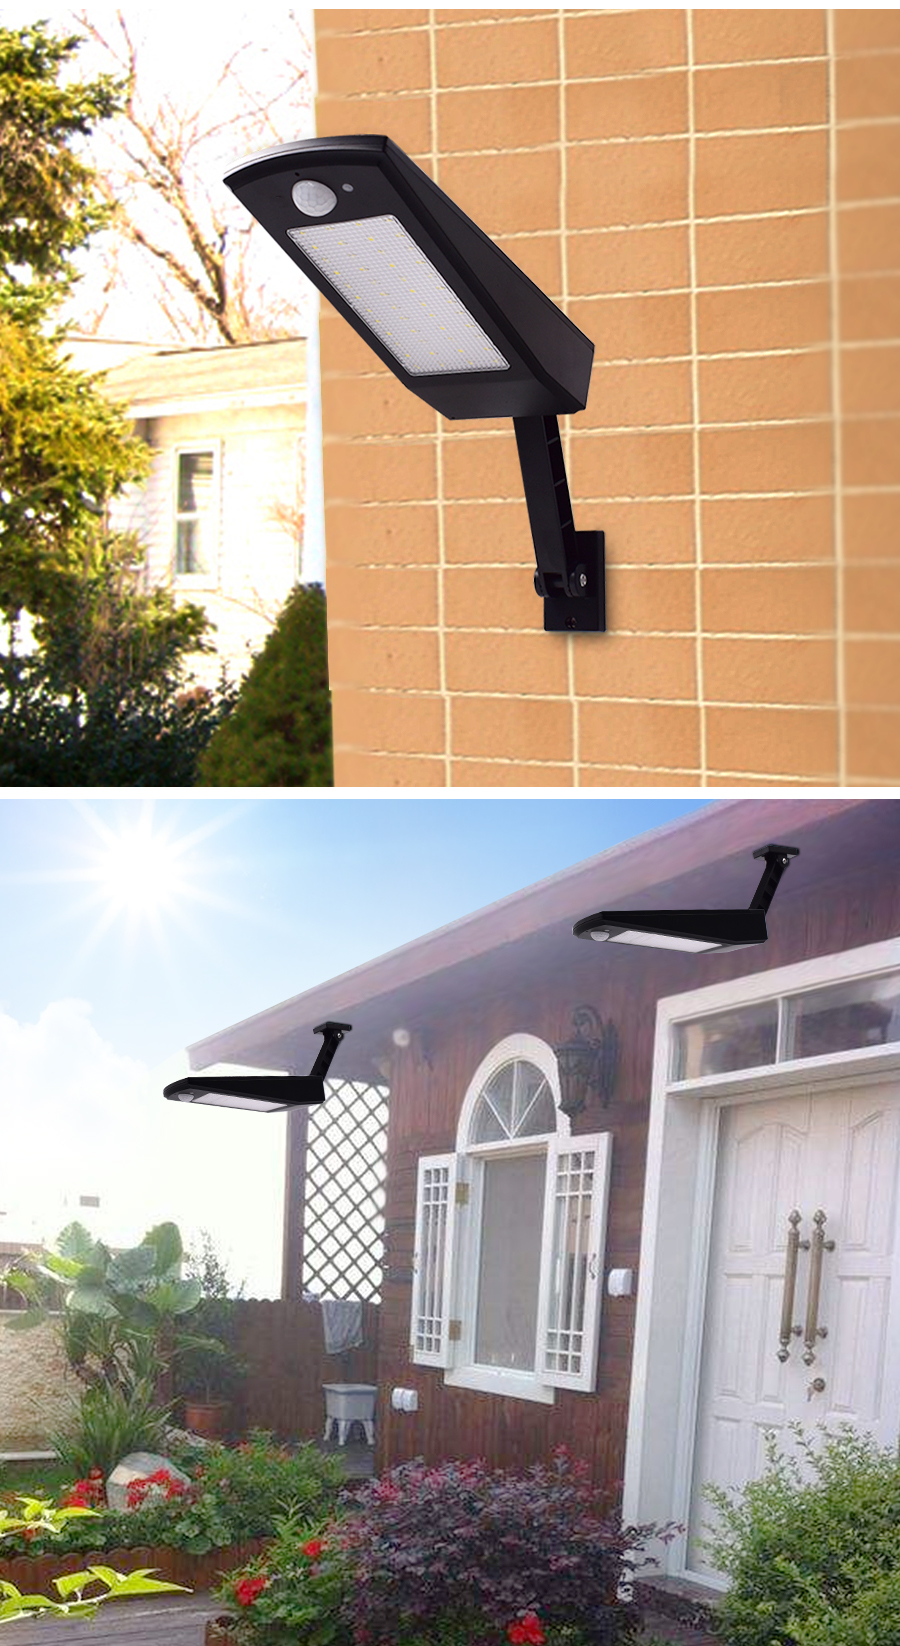 48 LED Outdoor Motion Sensor Light Solar Lights 900LM Lamp For Wall Garden Yard Sadoun Sales International